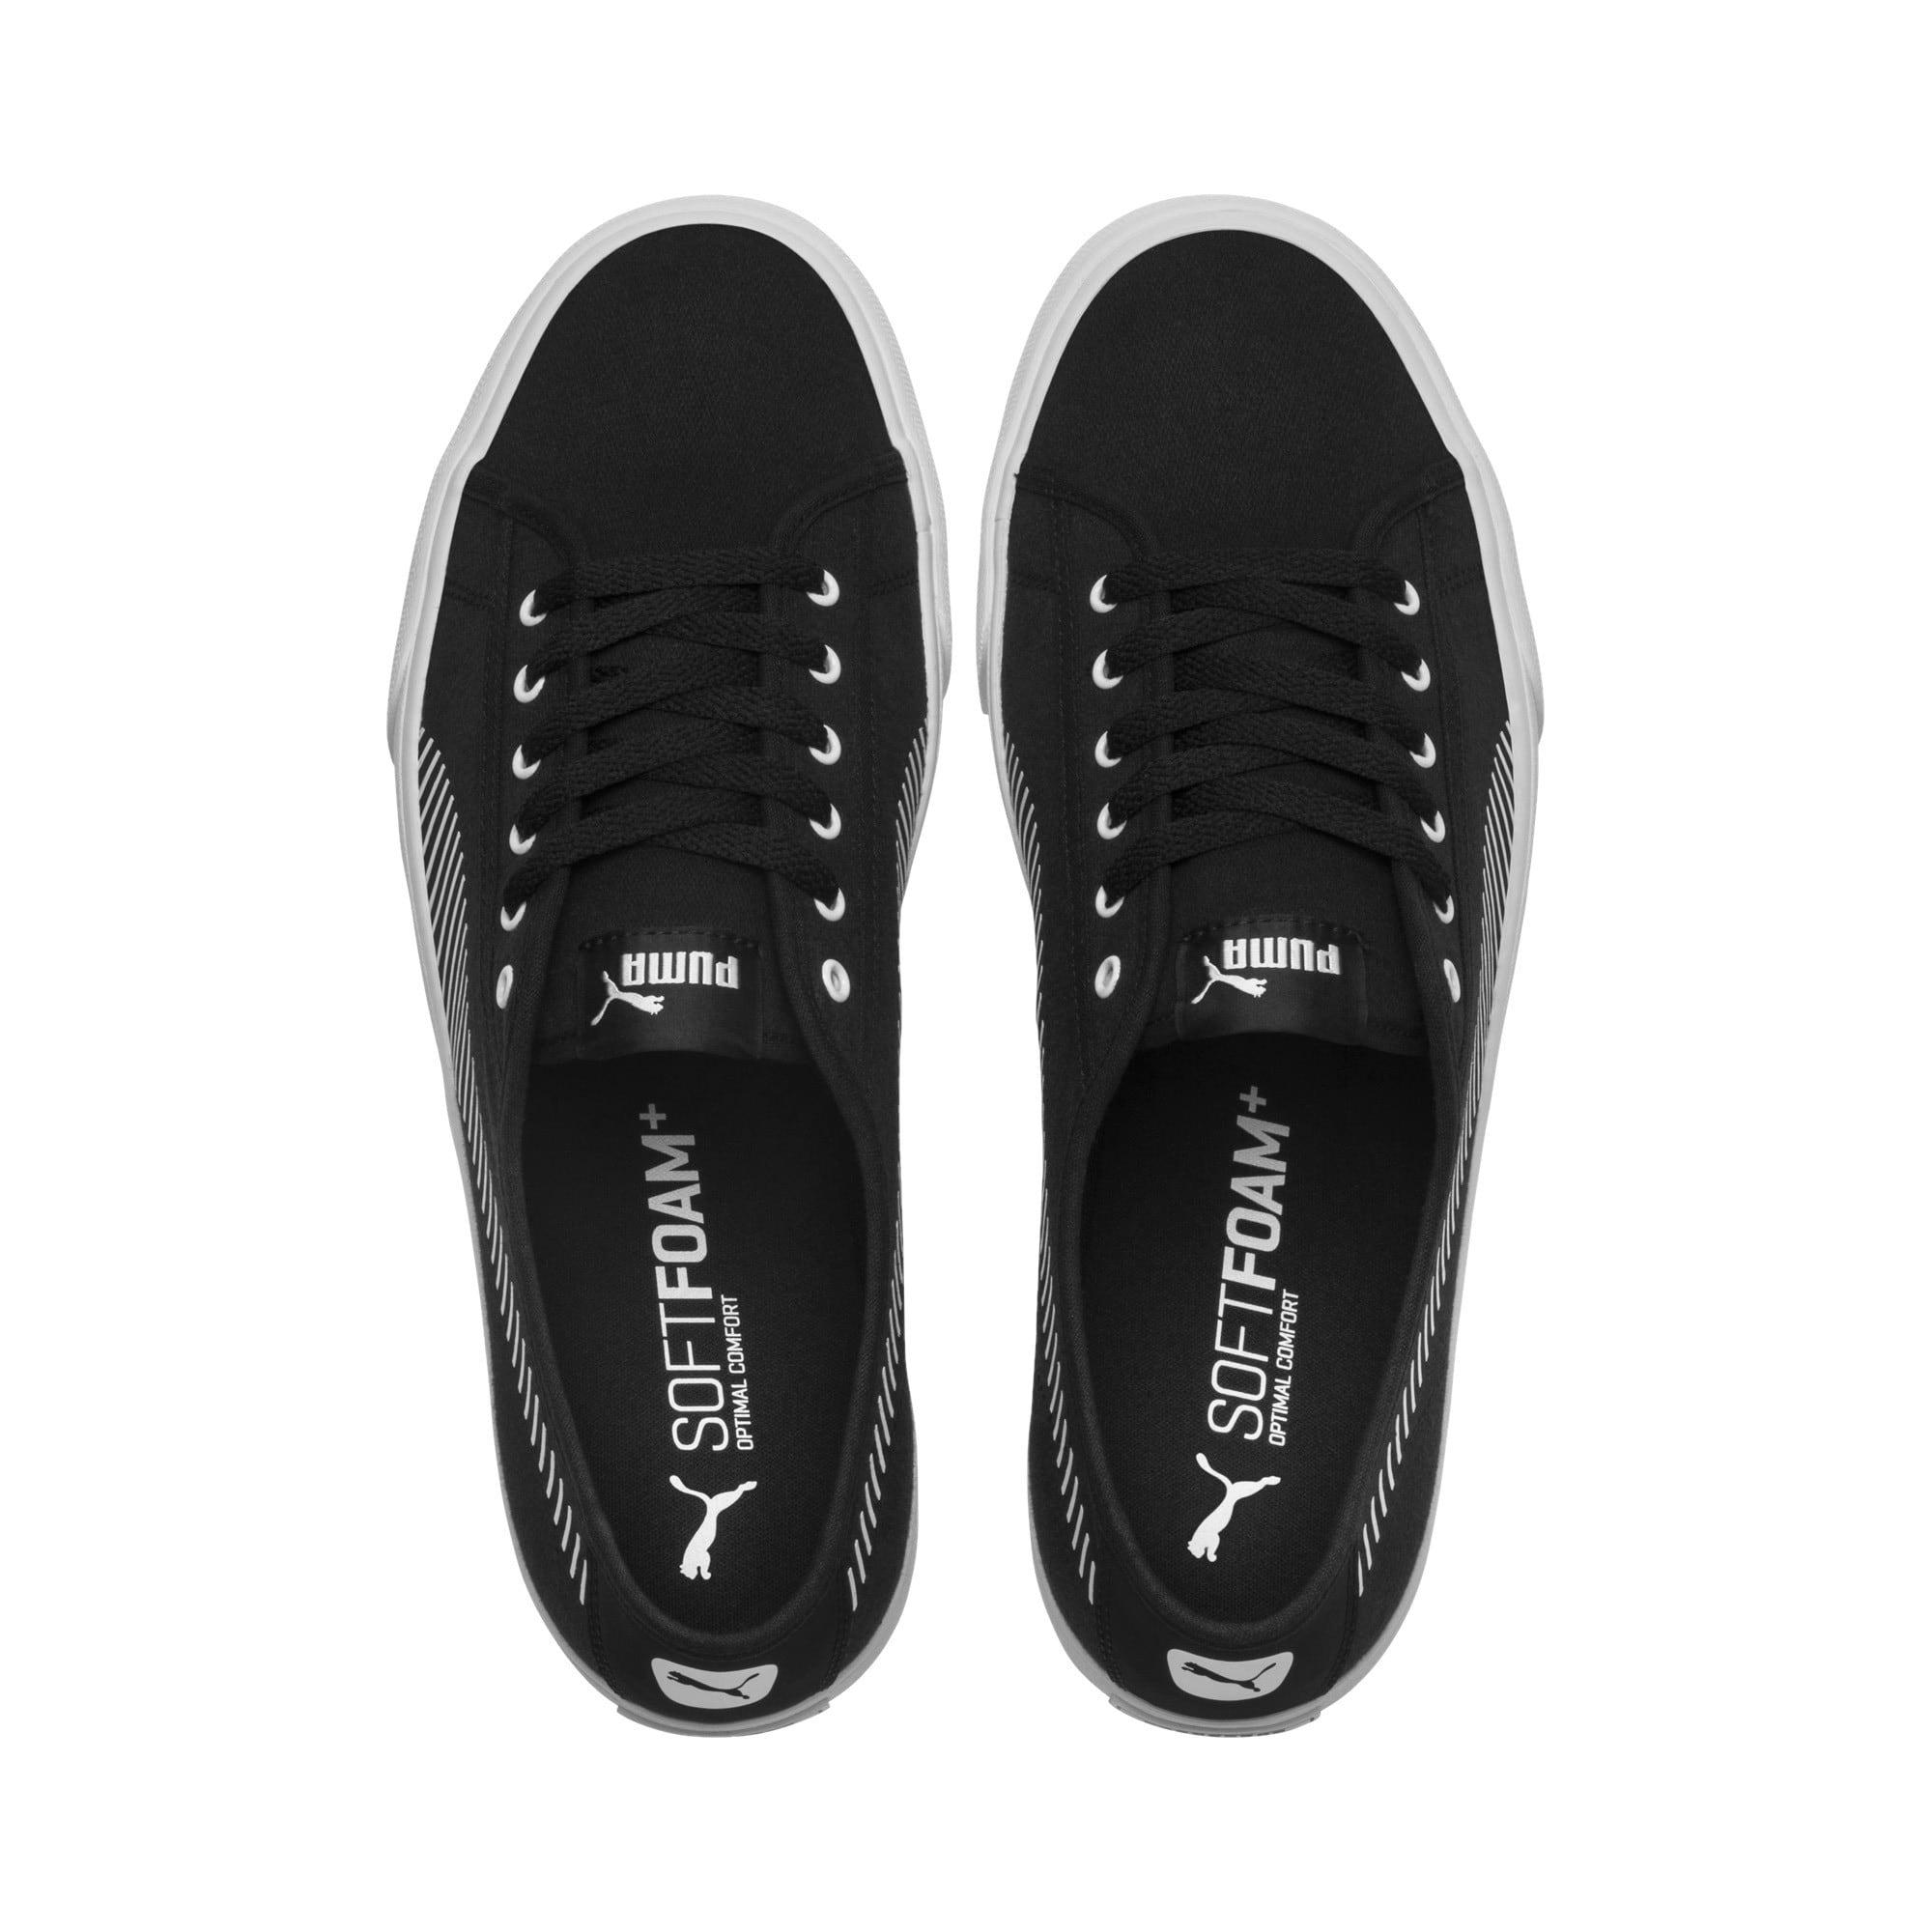 Thumbnail 6 of Bari Sneakers, Puma Black-Puma White, medium